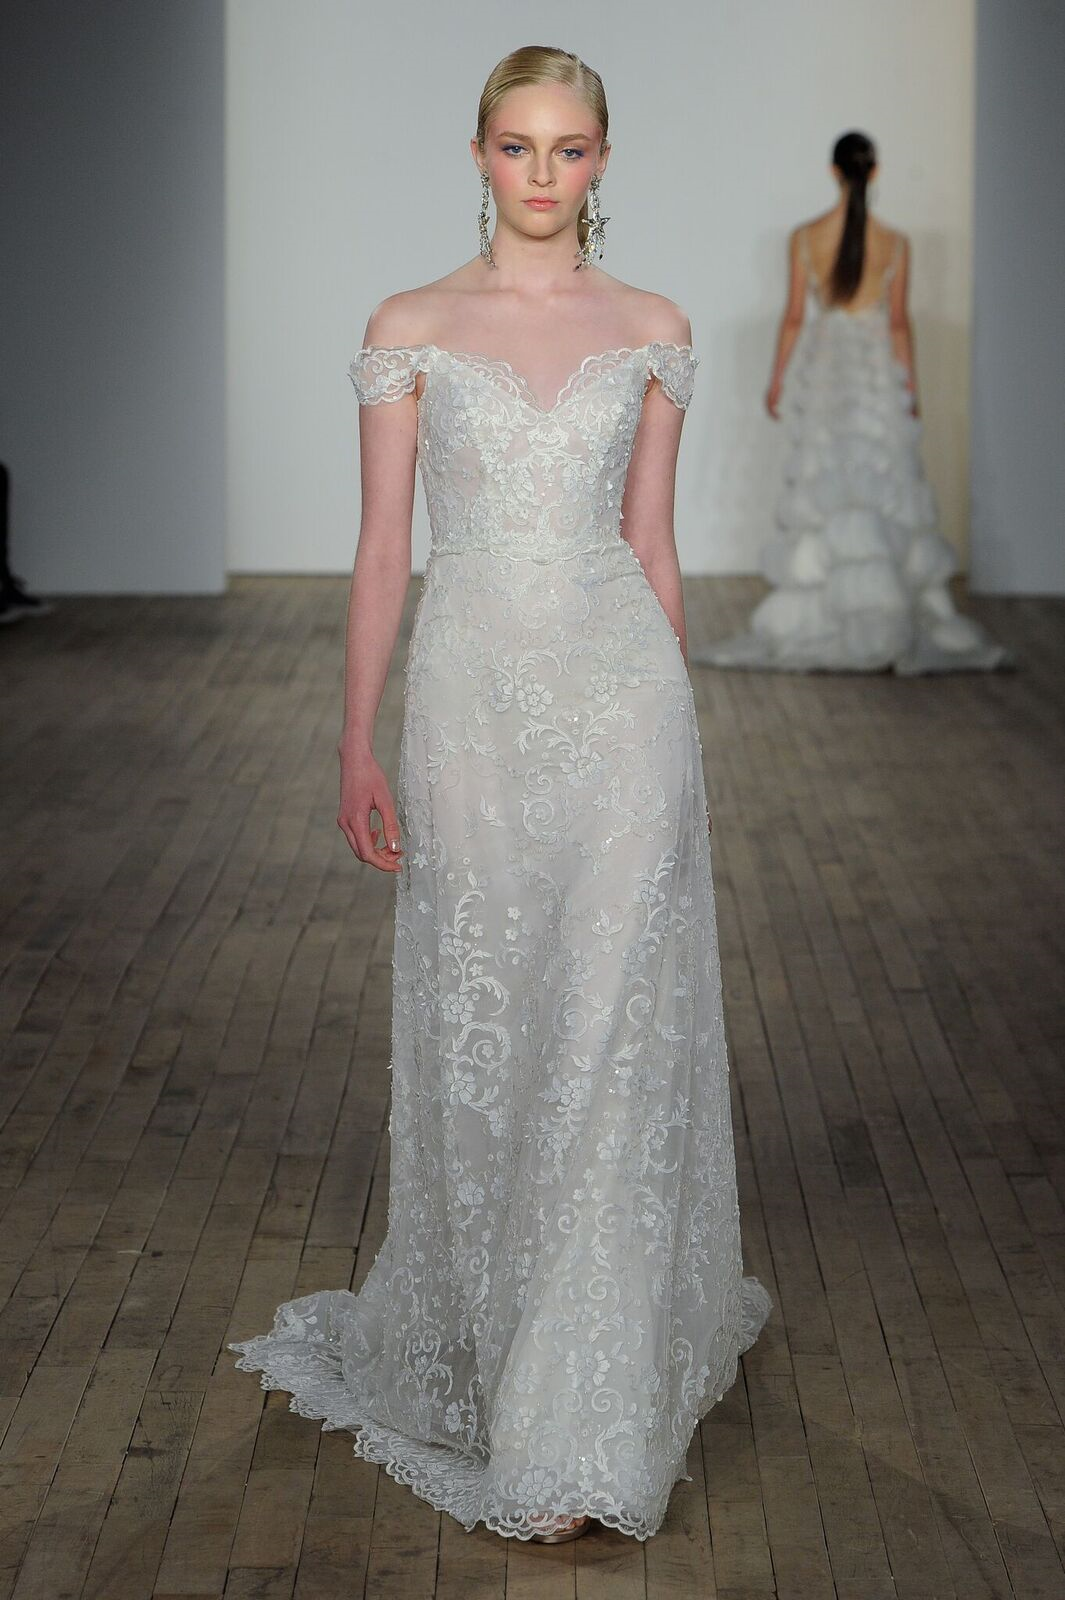 Off The Shoulder Wedding Dresses Lazaro Style 3906 Bea: Simple White Wedding Dress Bea At Websimilar.org